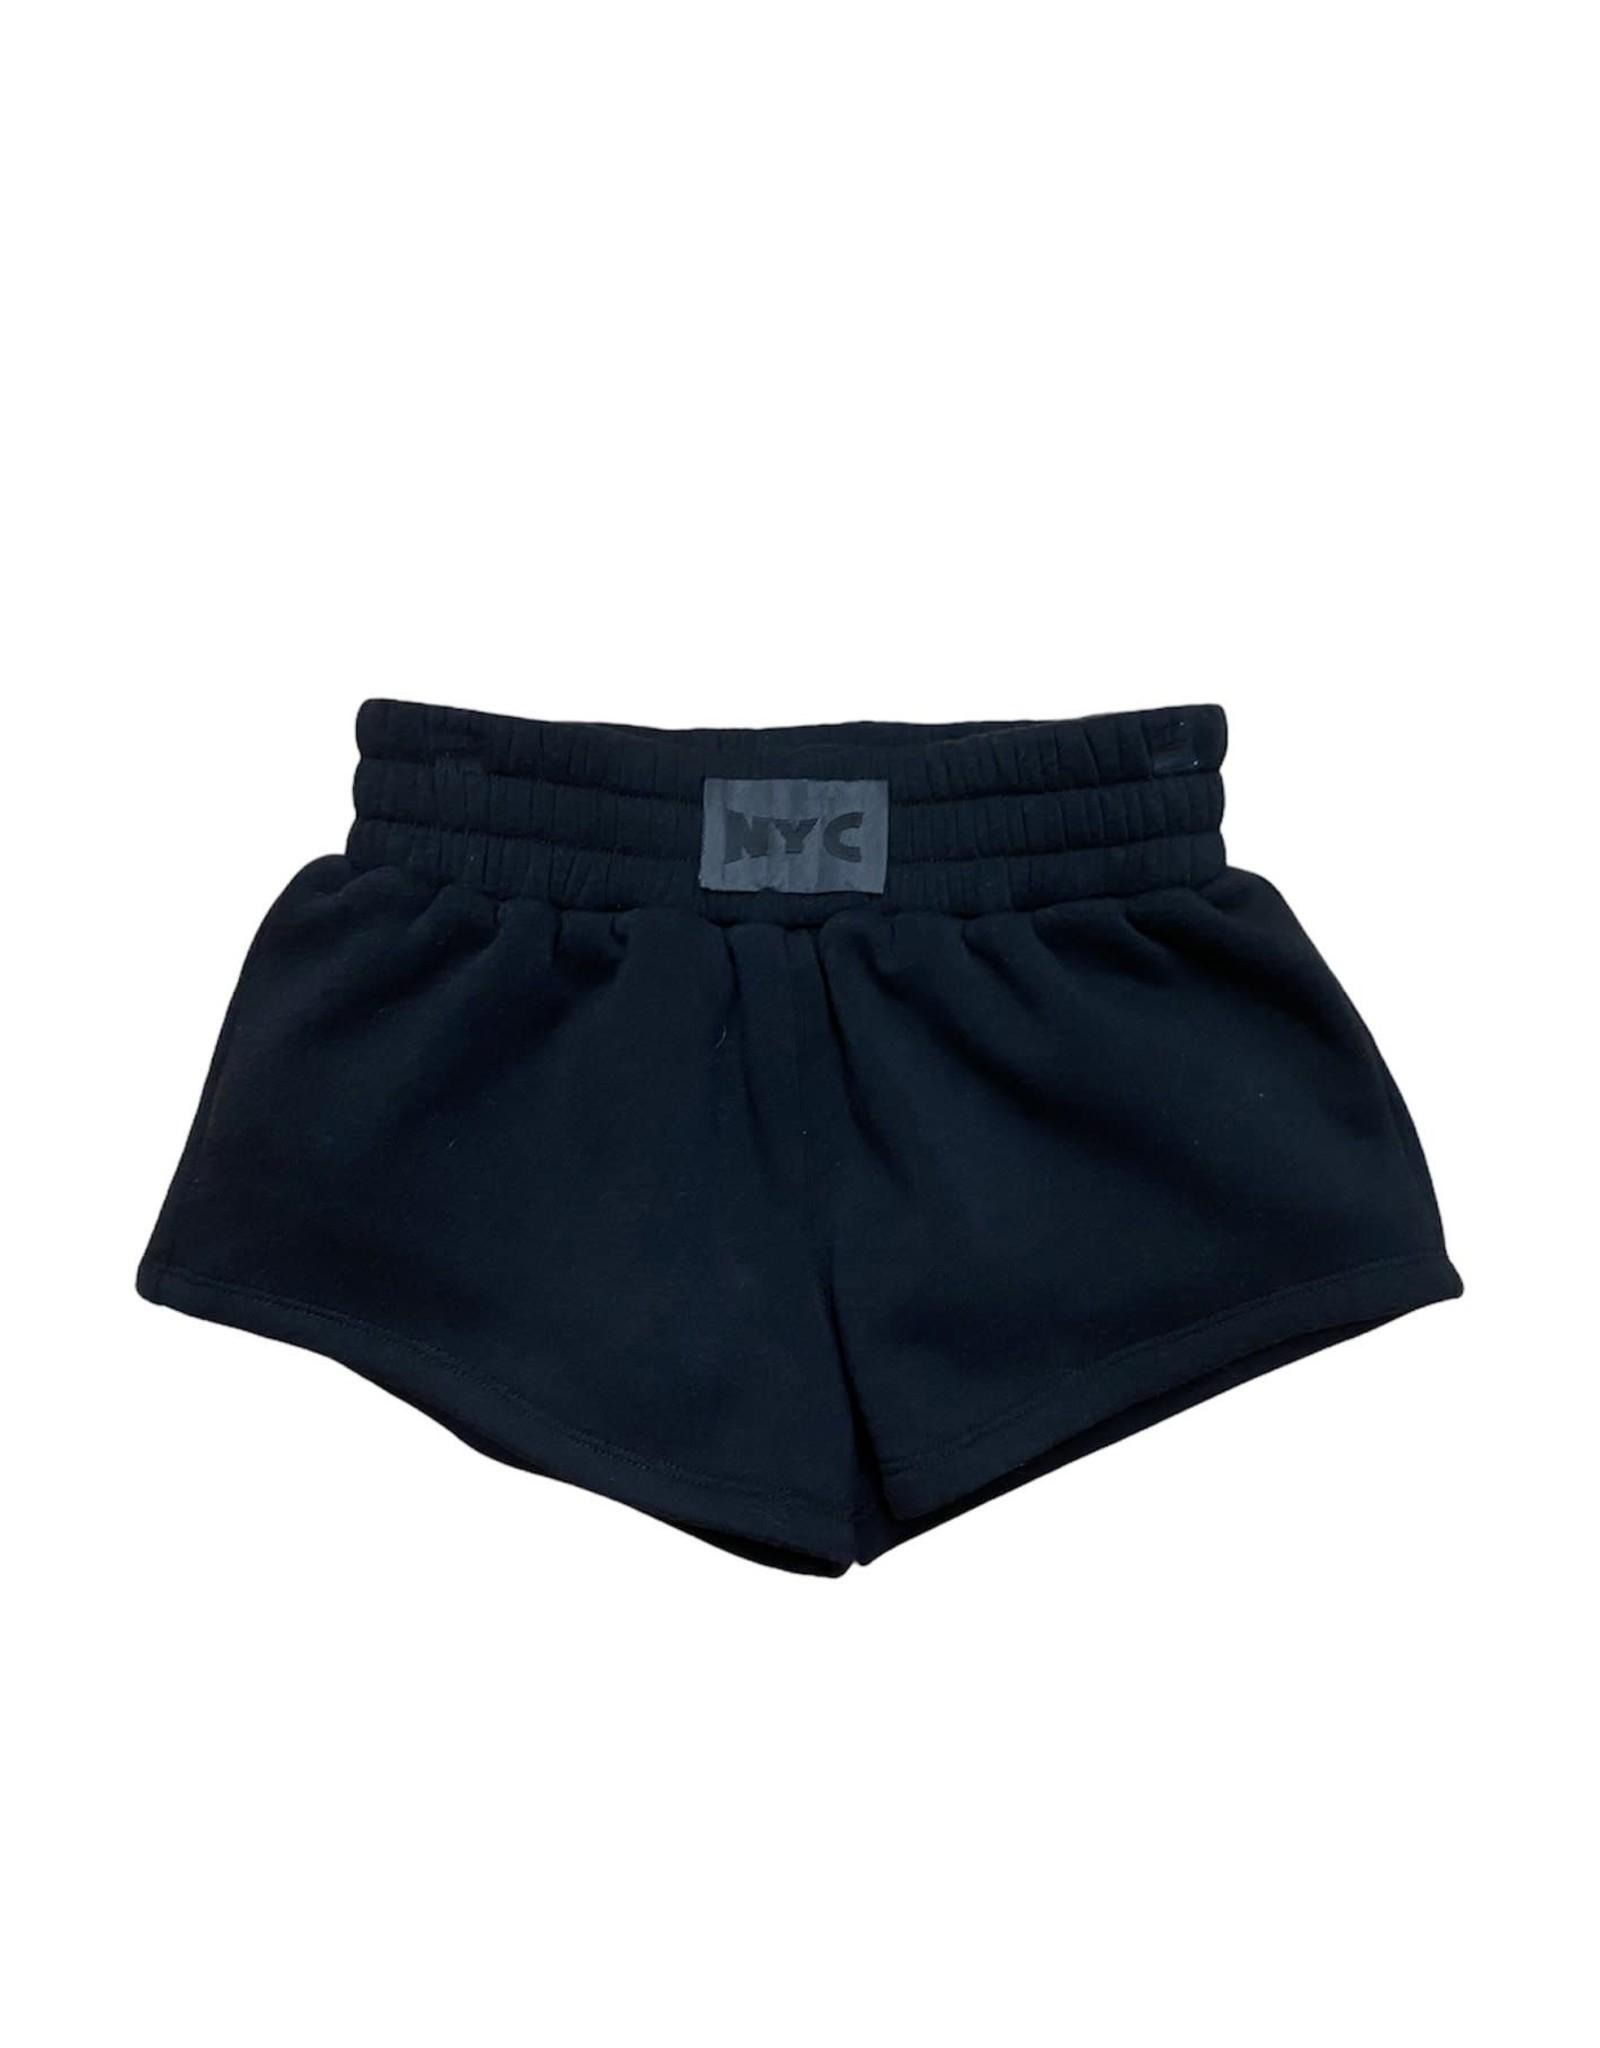 KatieJnyc Londyn Black Shorts